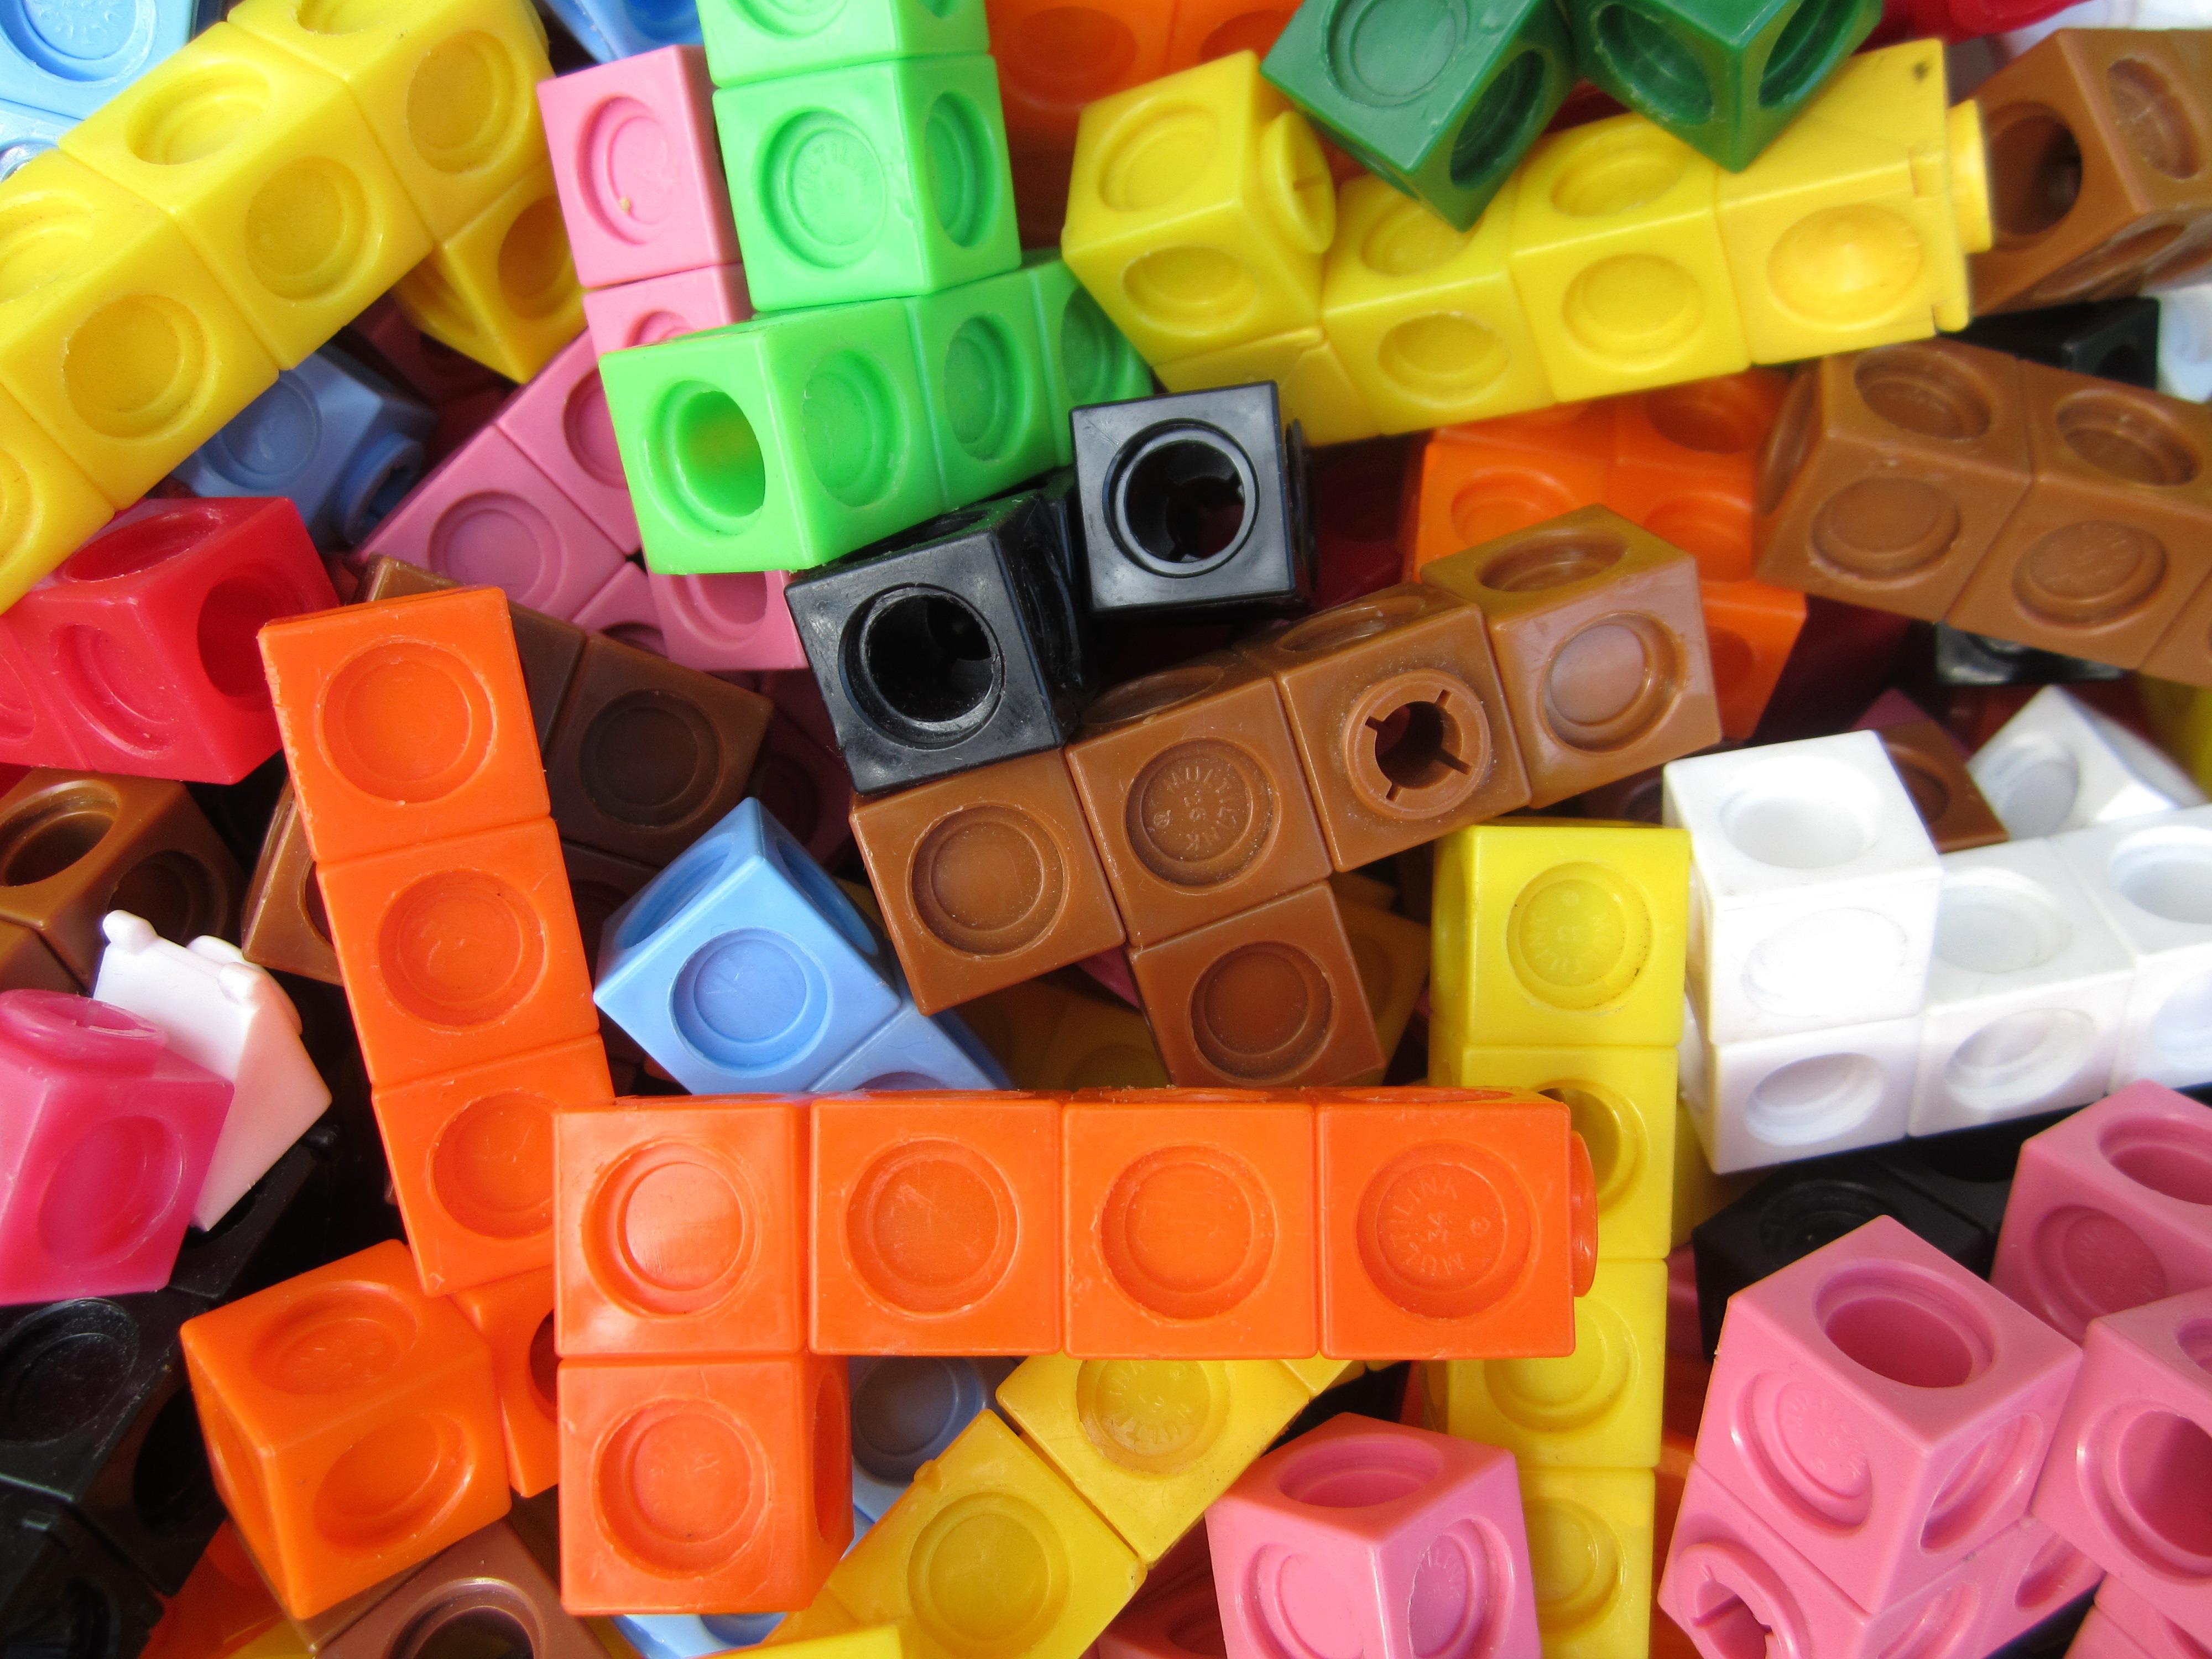 https://i1.wp.com/upload.wikimedia.org/wikipedia/commons/1/1c/Multilink_cubes.JPG